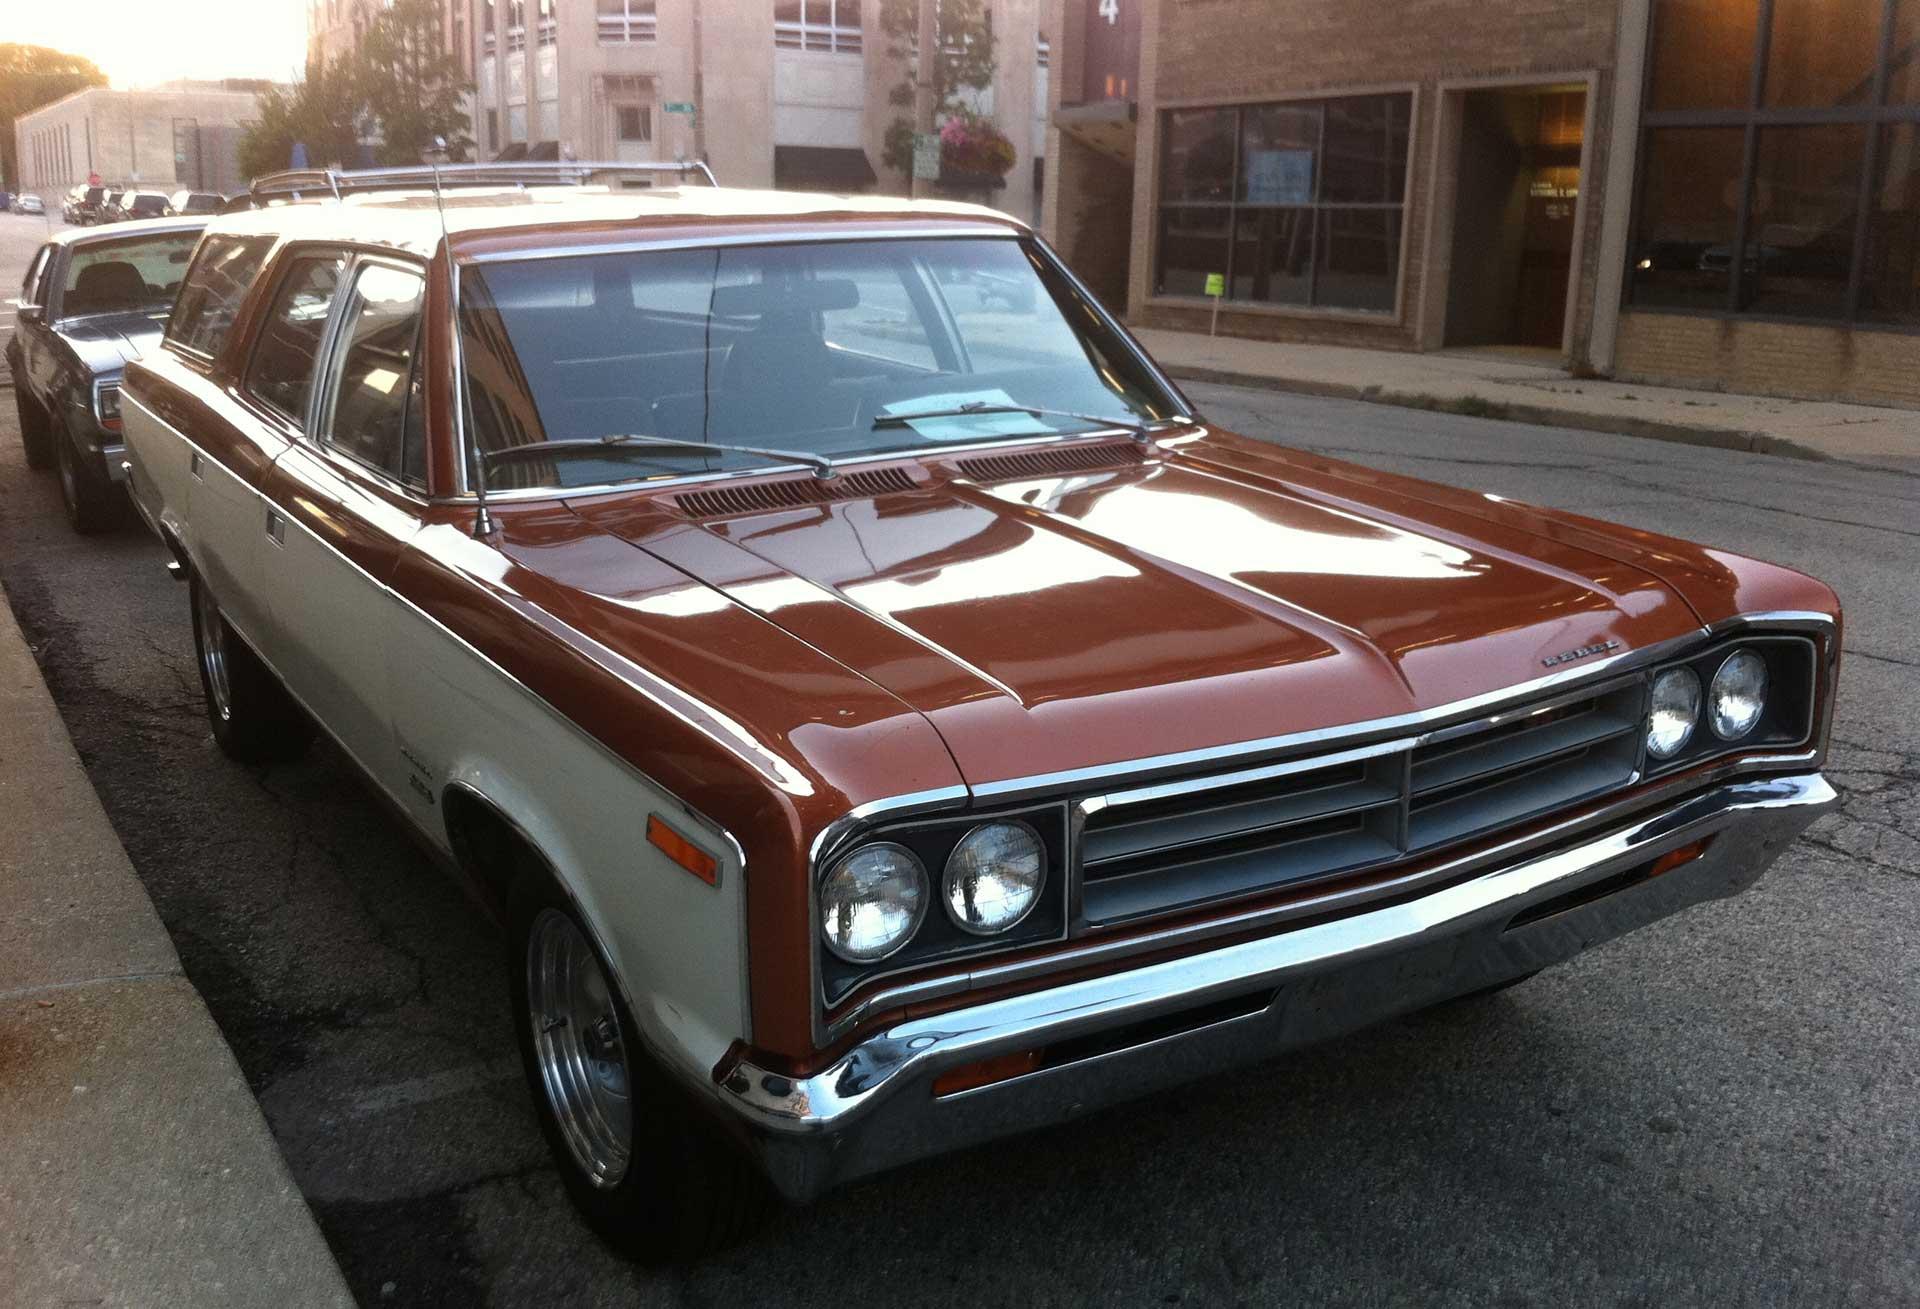 AMC Rebel 1970 station wagon